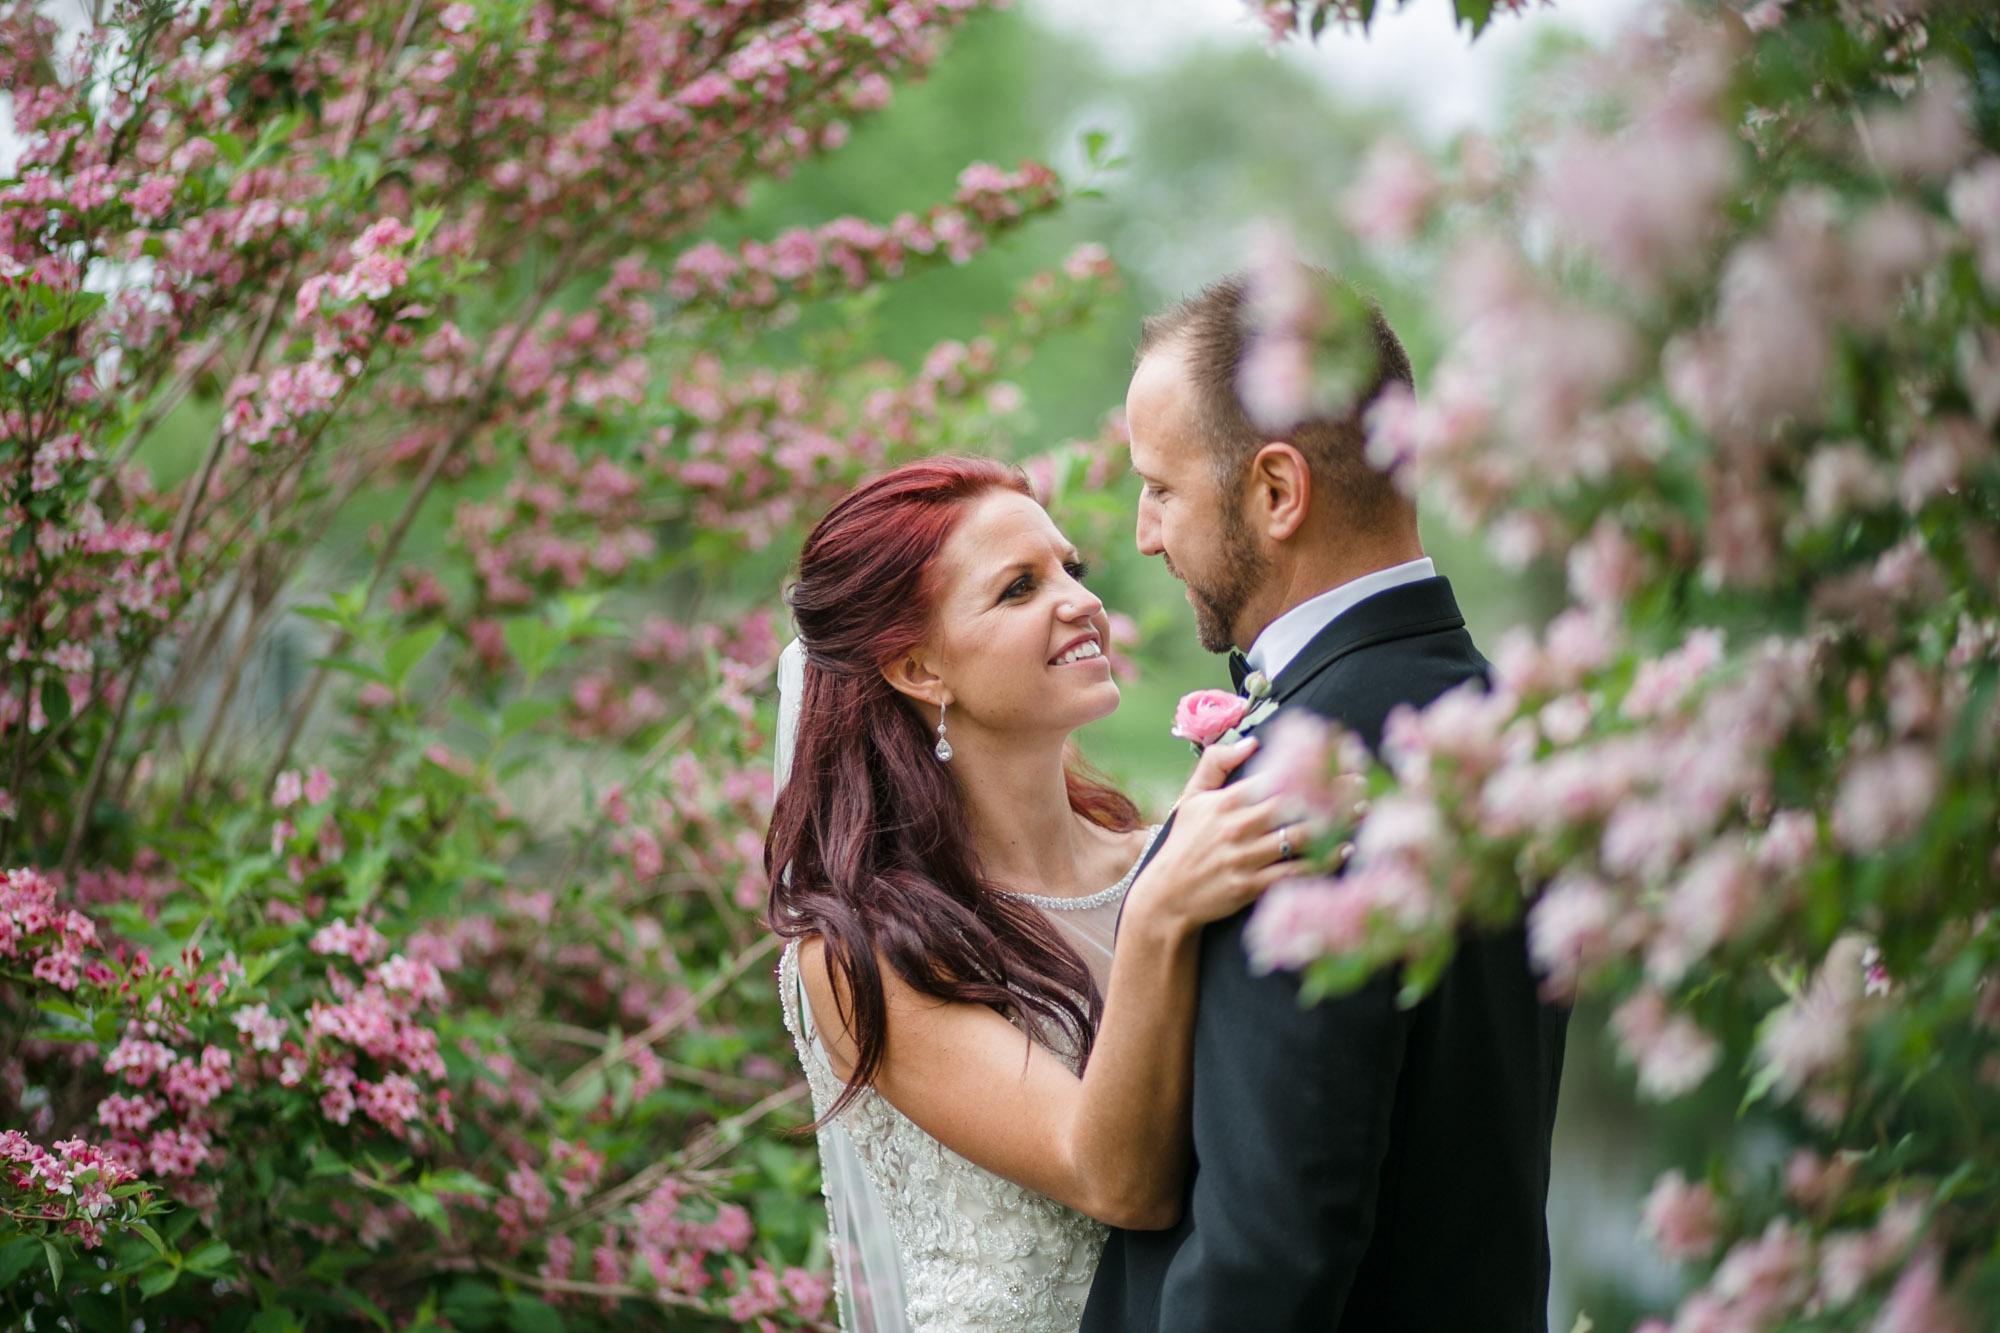 hensville-wedding-downtown-toledo-ohio (58 of 103).jpg